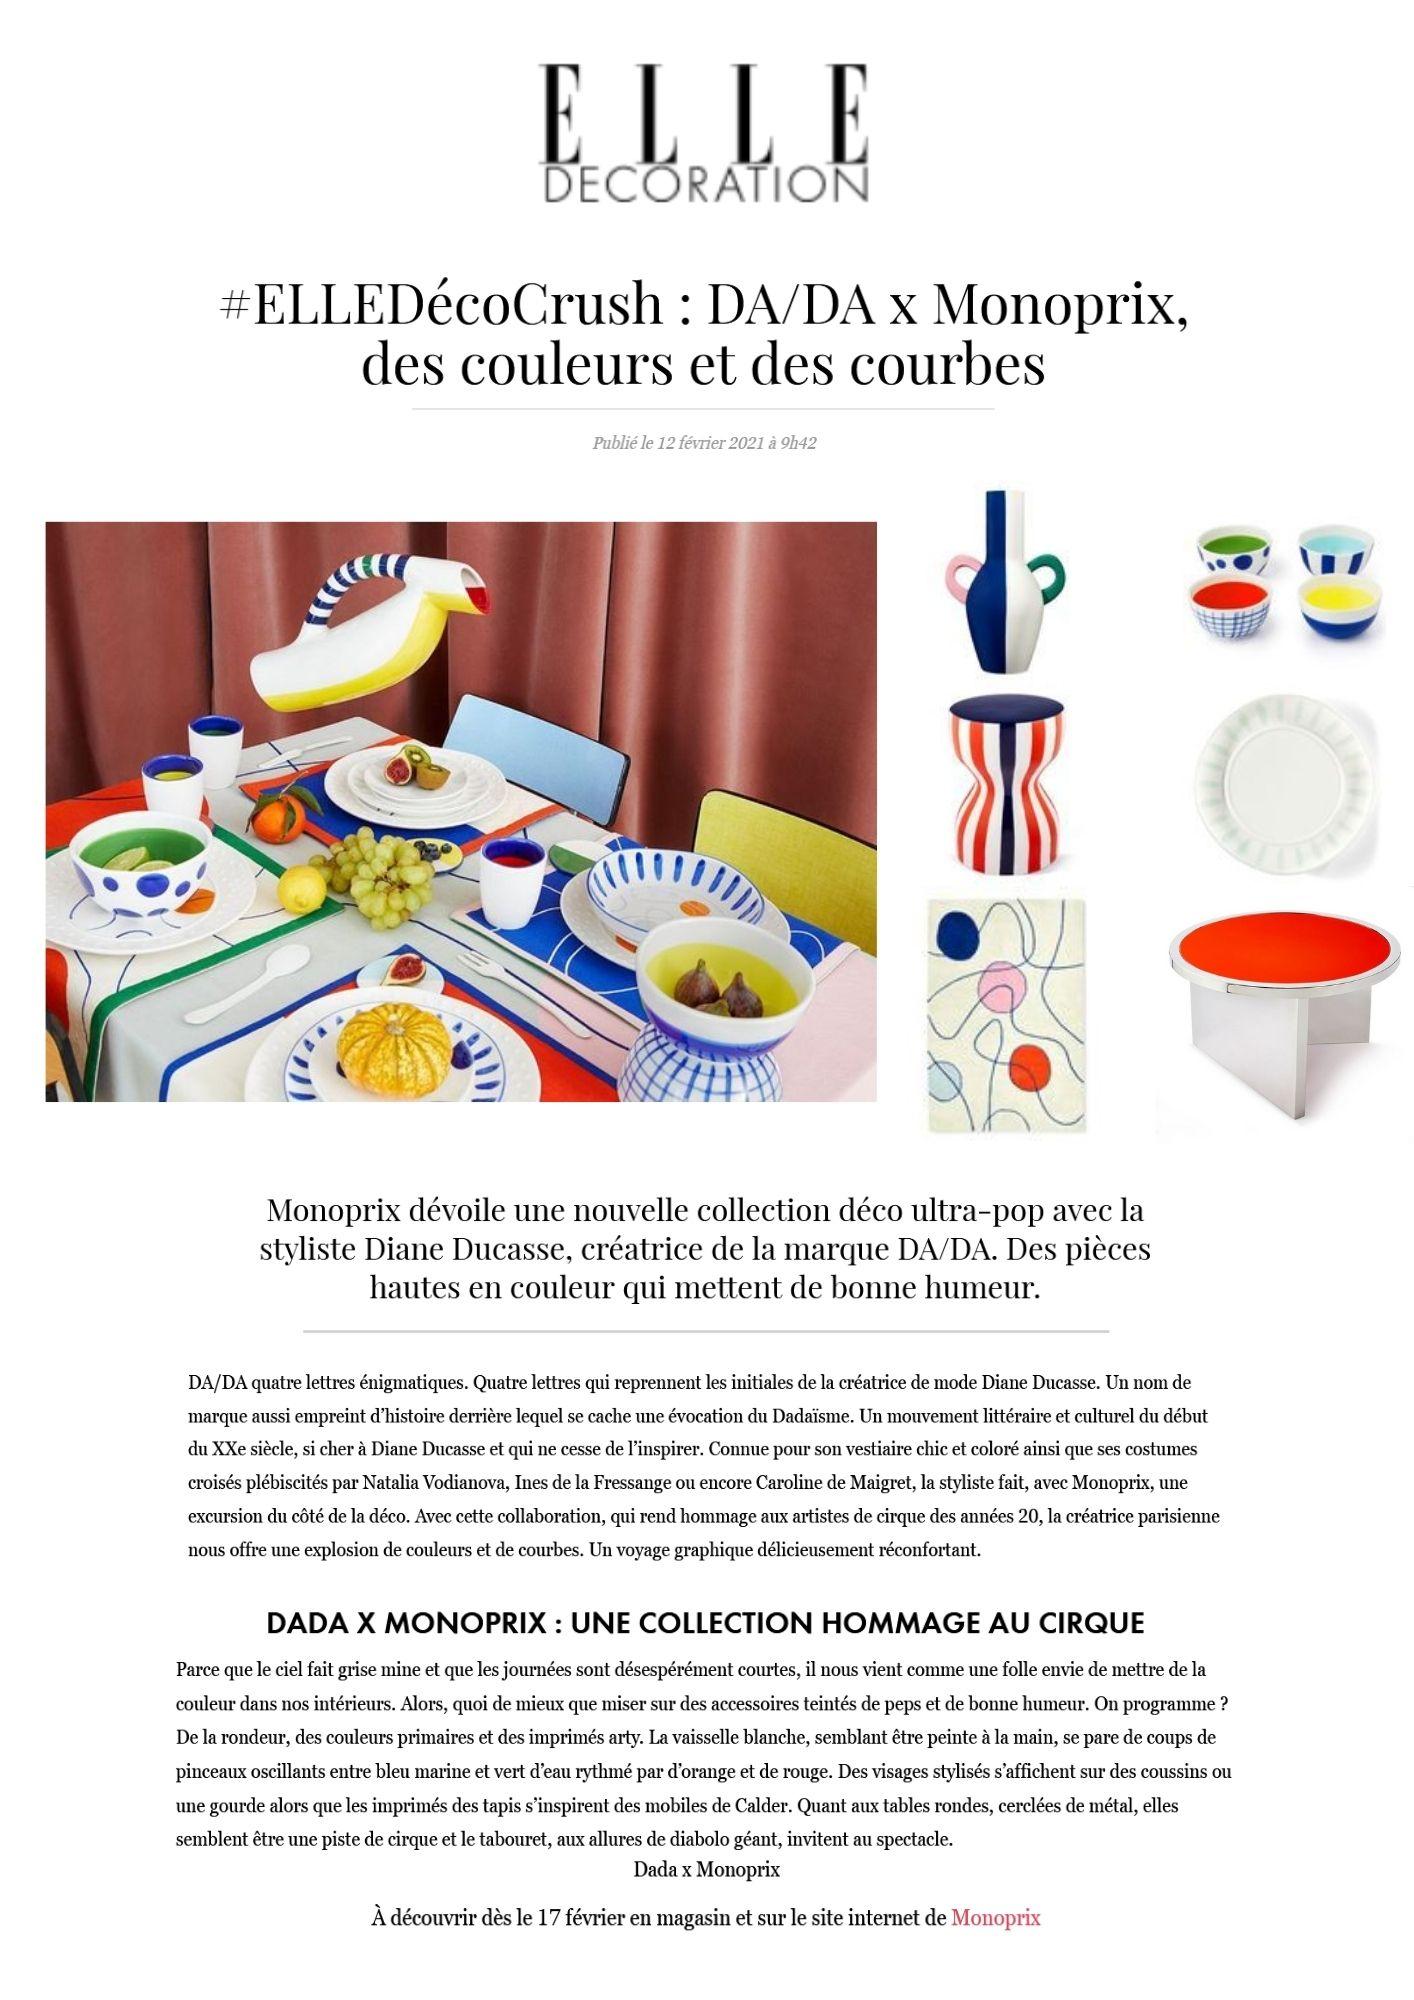 dada-diane-ducasse-elle-décoration-presse-février-2021